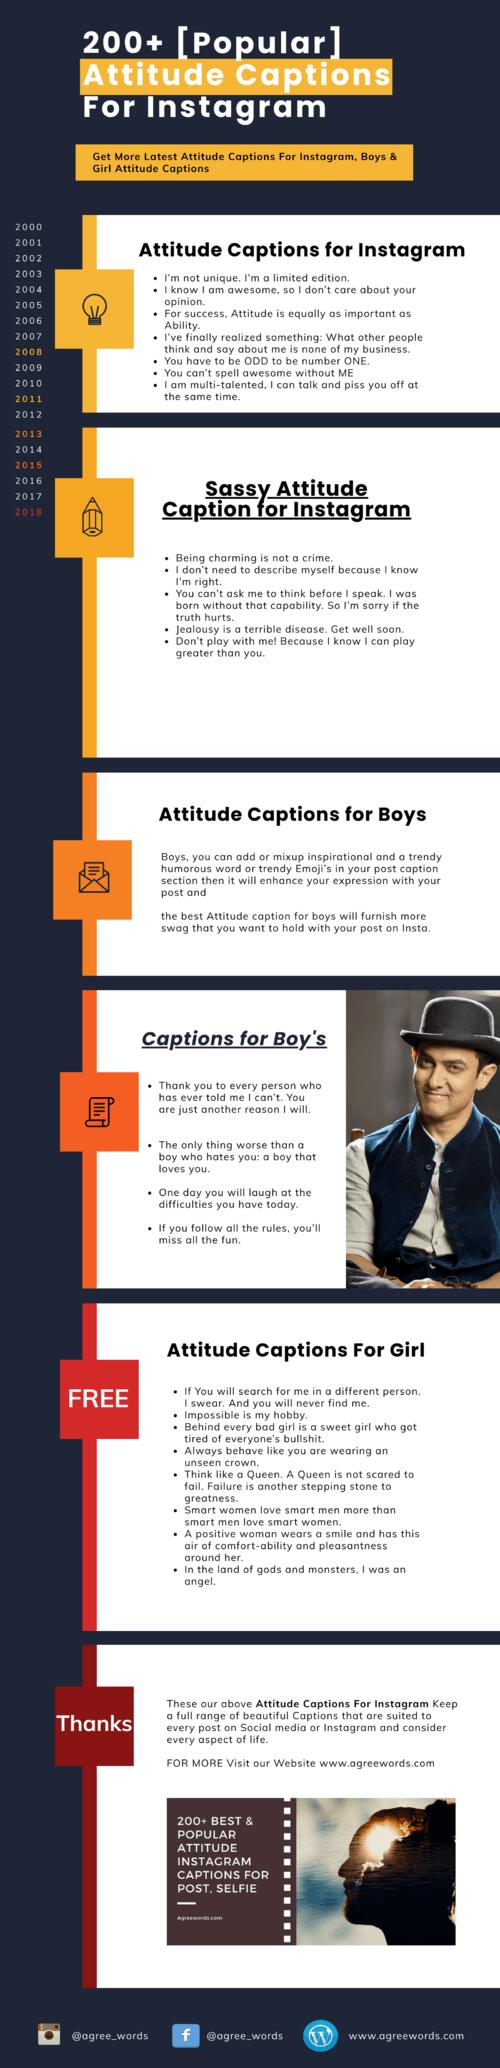 Attitude Captions For Instagram via agree words